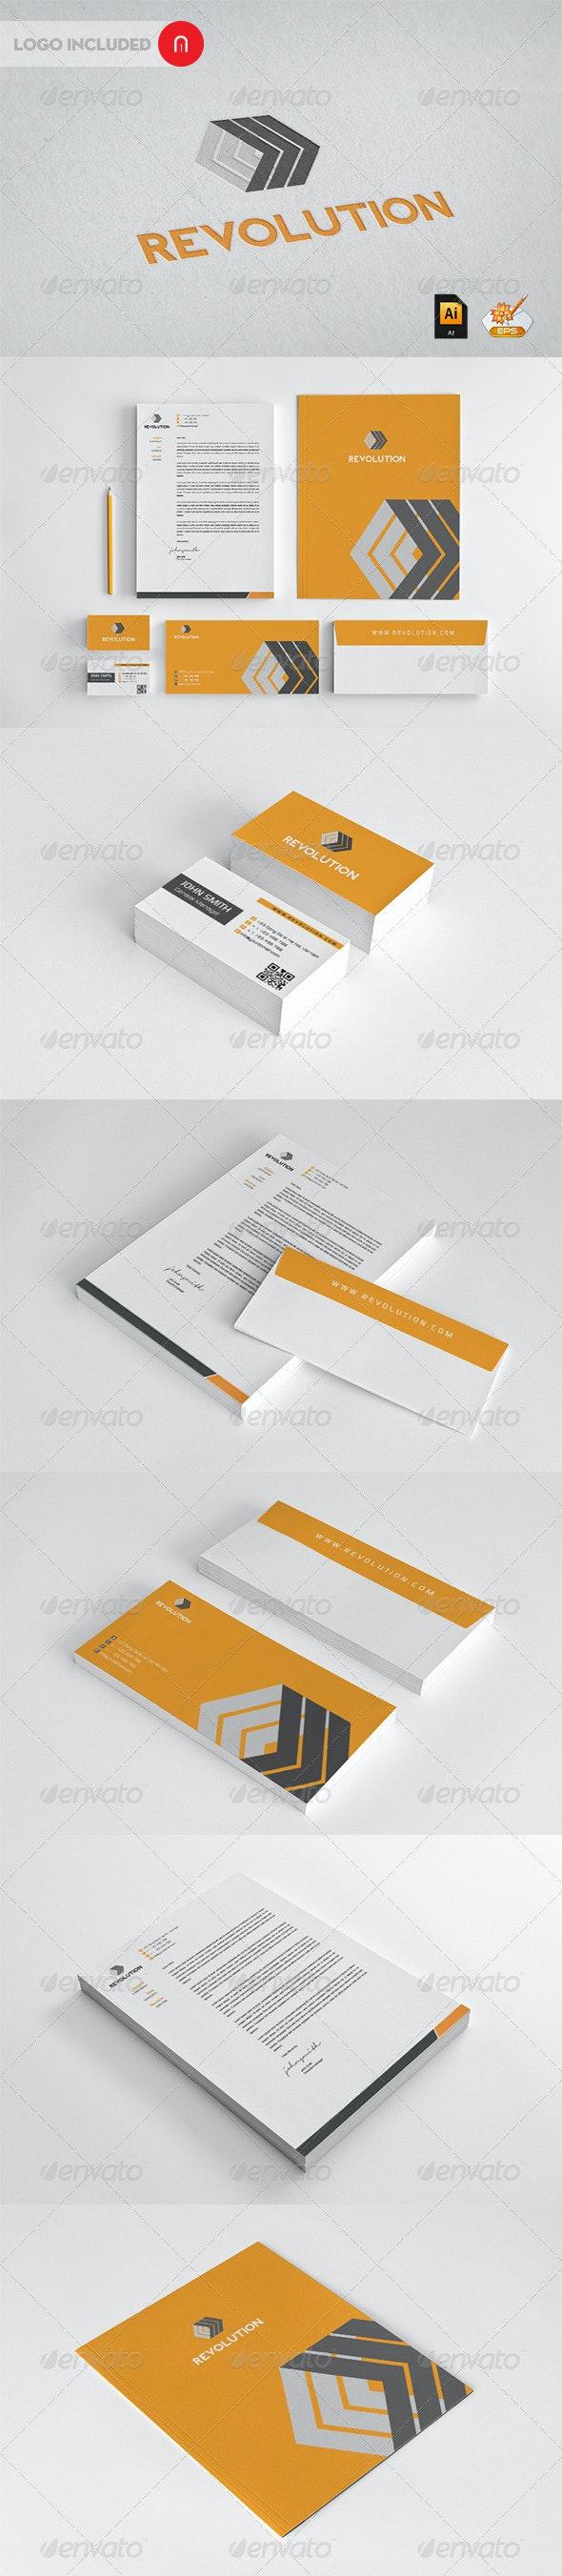 Revolution Corporate Identity - Stationery Print Templates